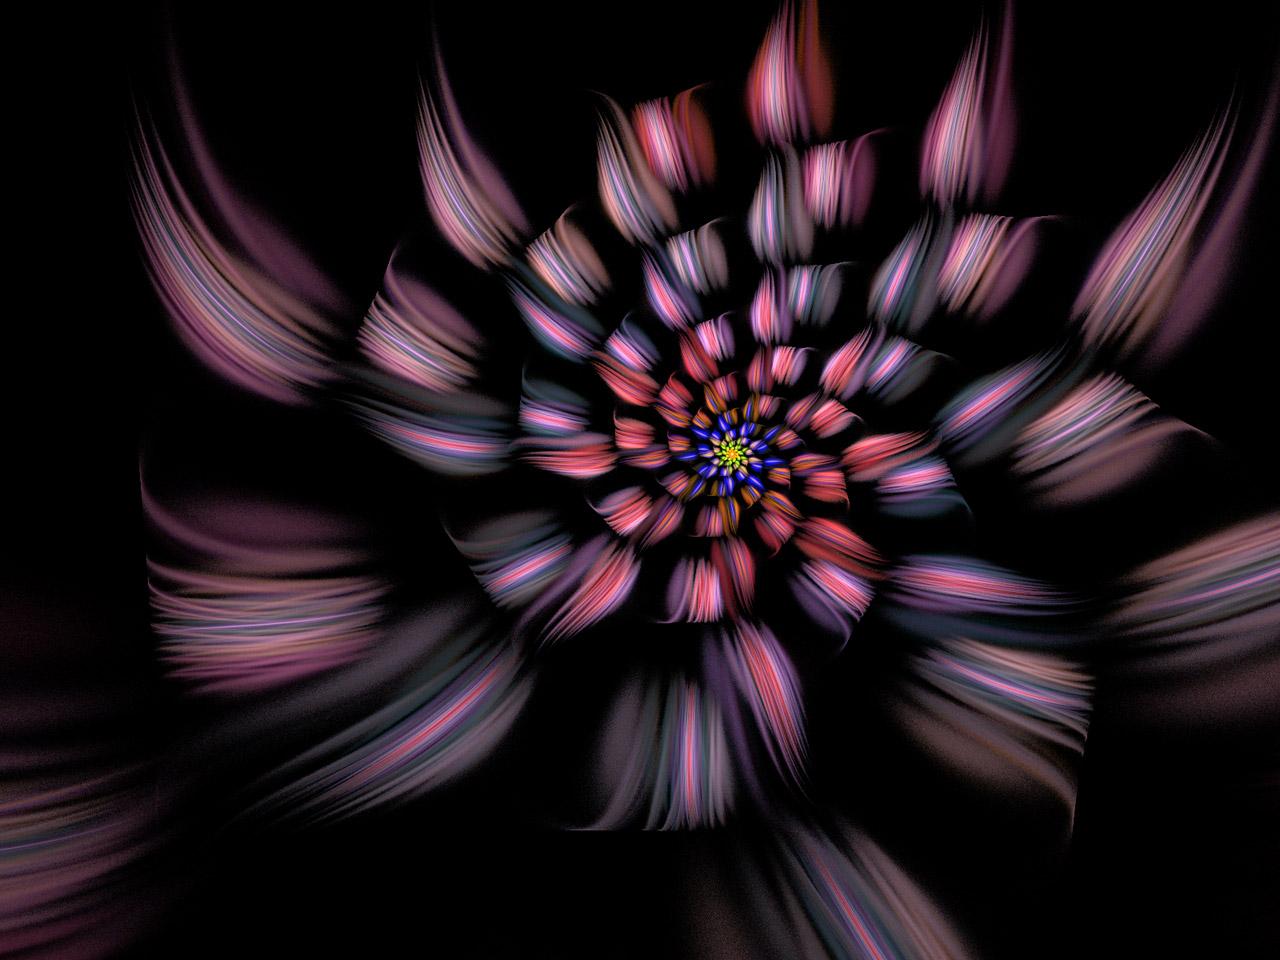 padmasana-fractal-espiral-floral-tantra-press-tantraesdevocion-inciensoshop